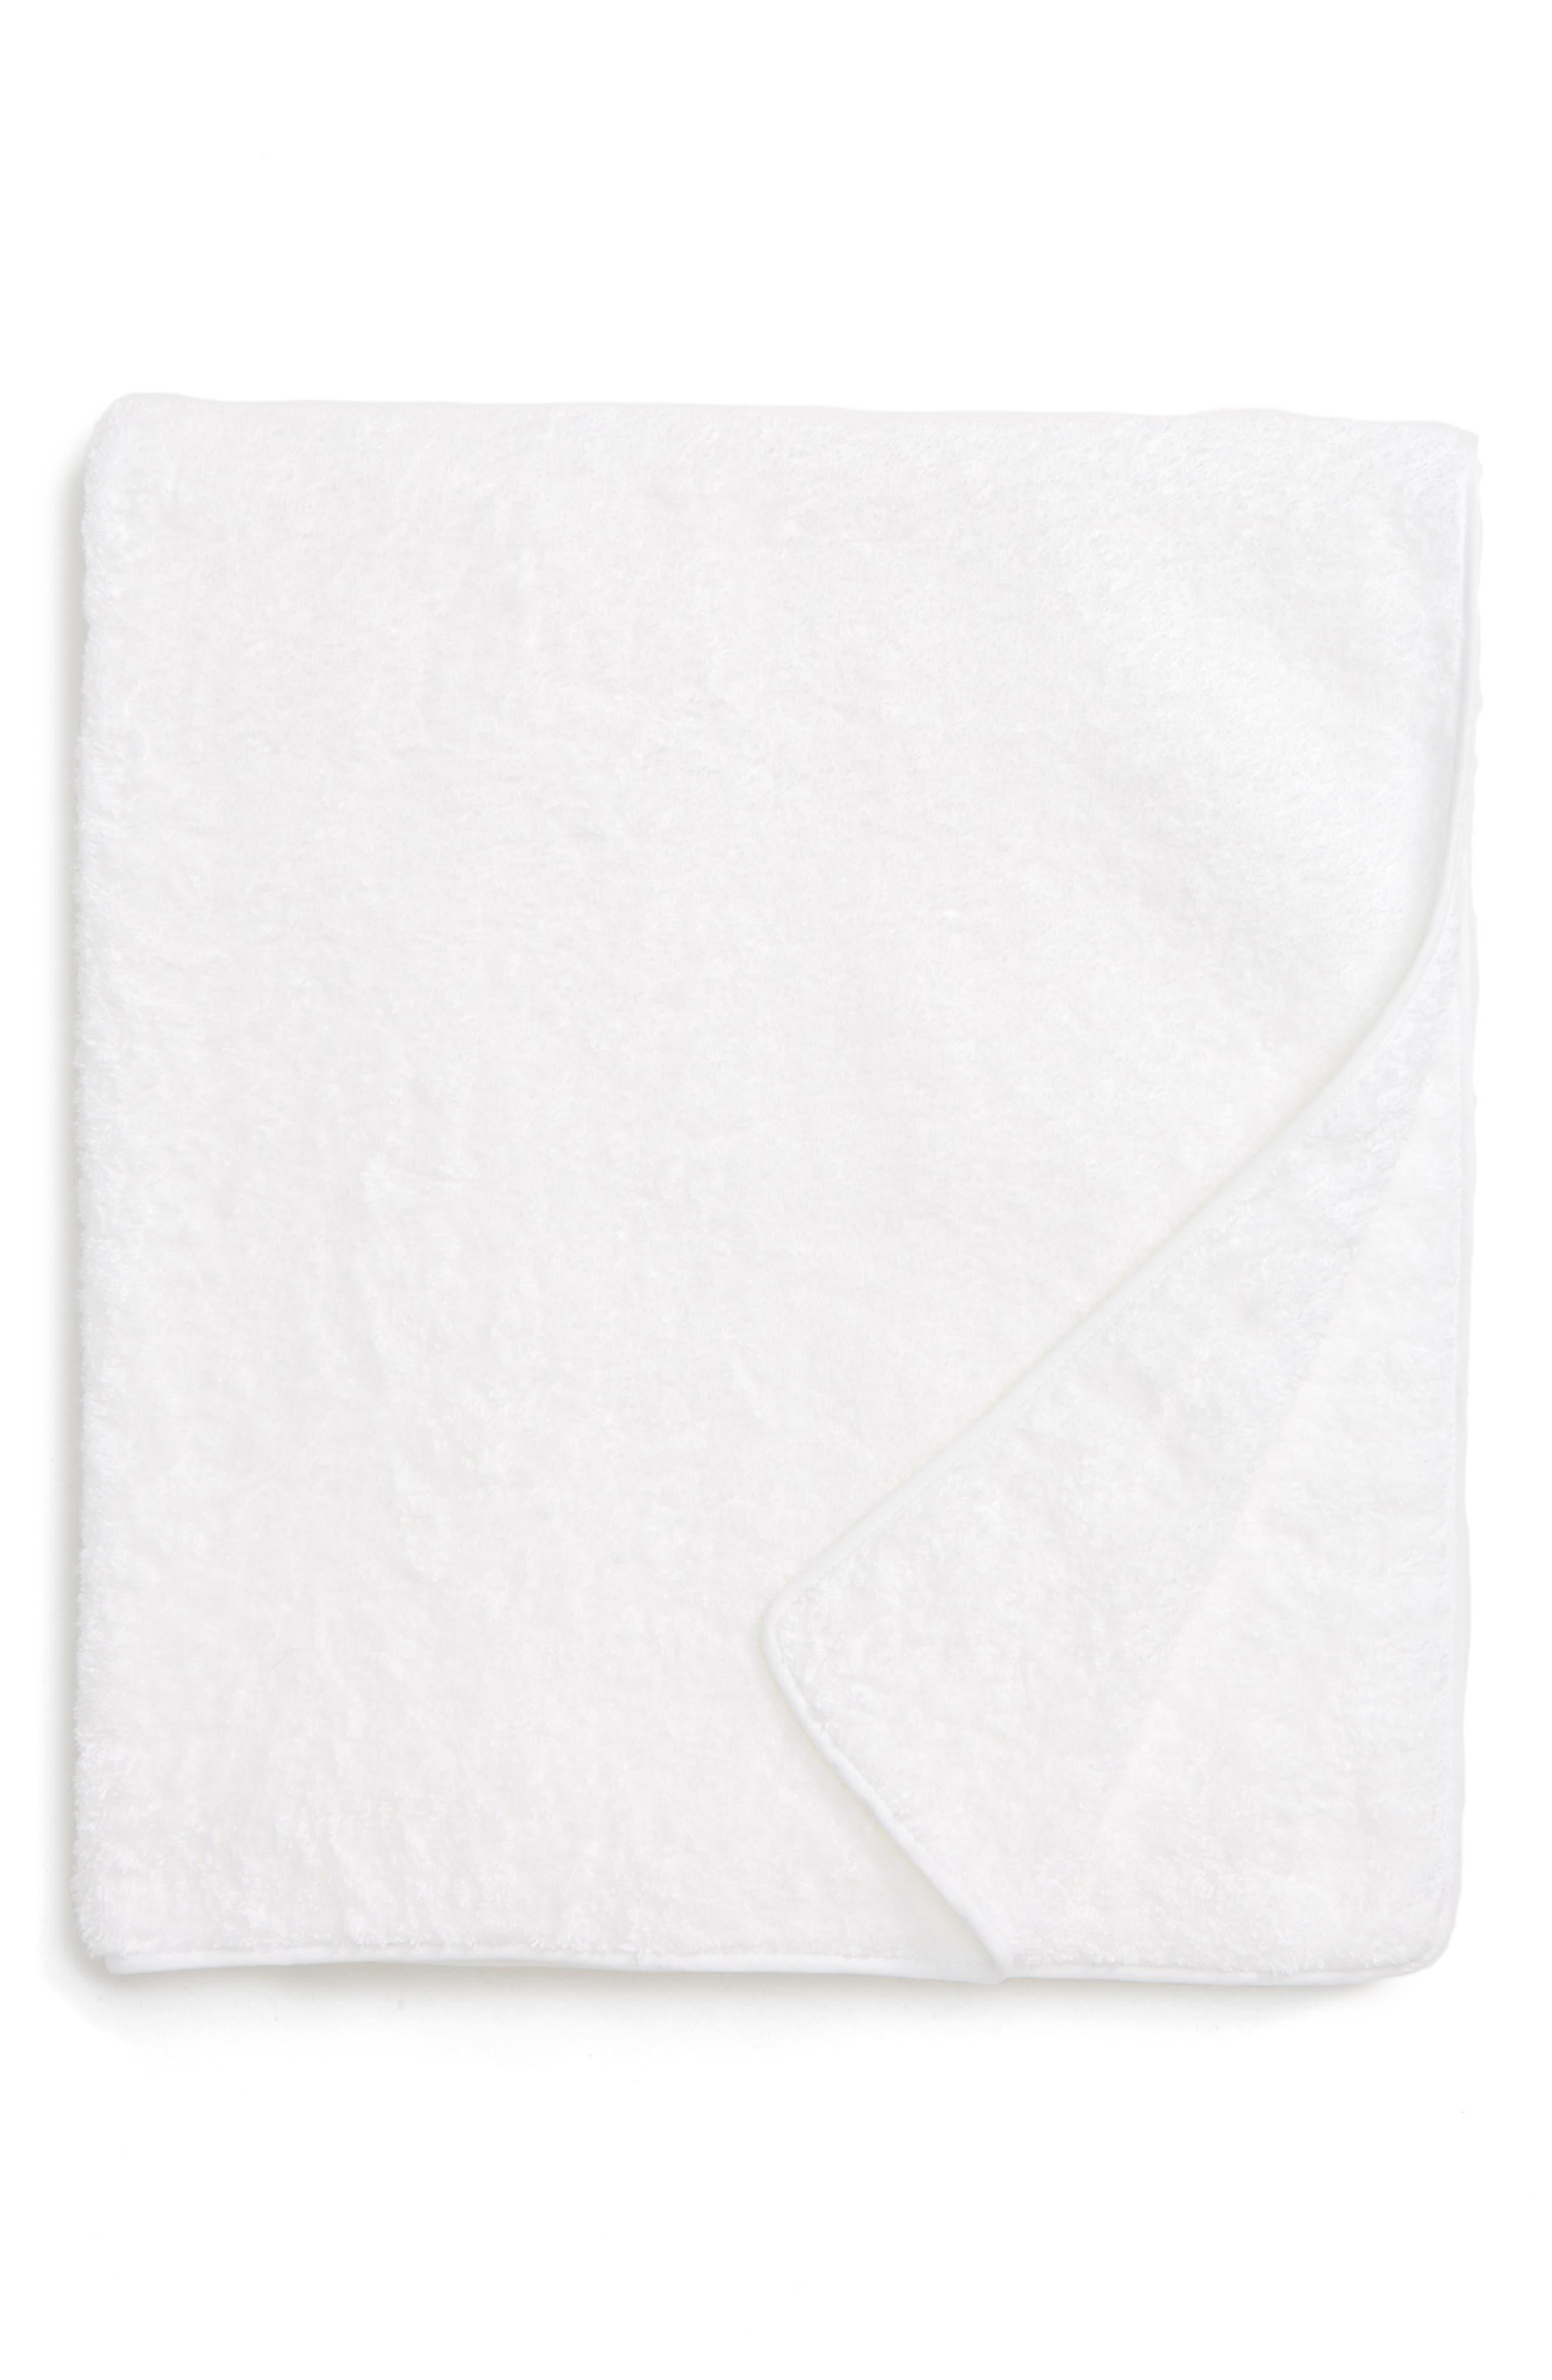 Main Image - Matouk Cairo Bath Towel